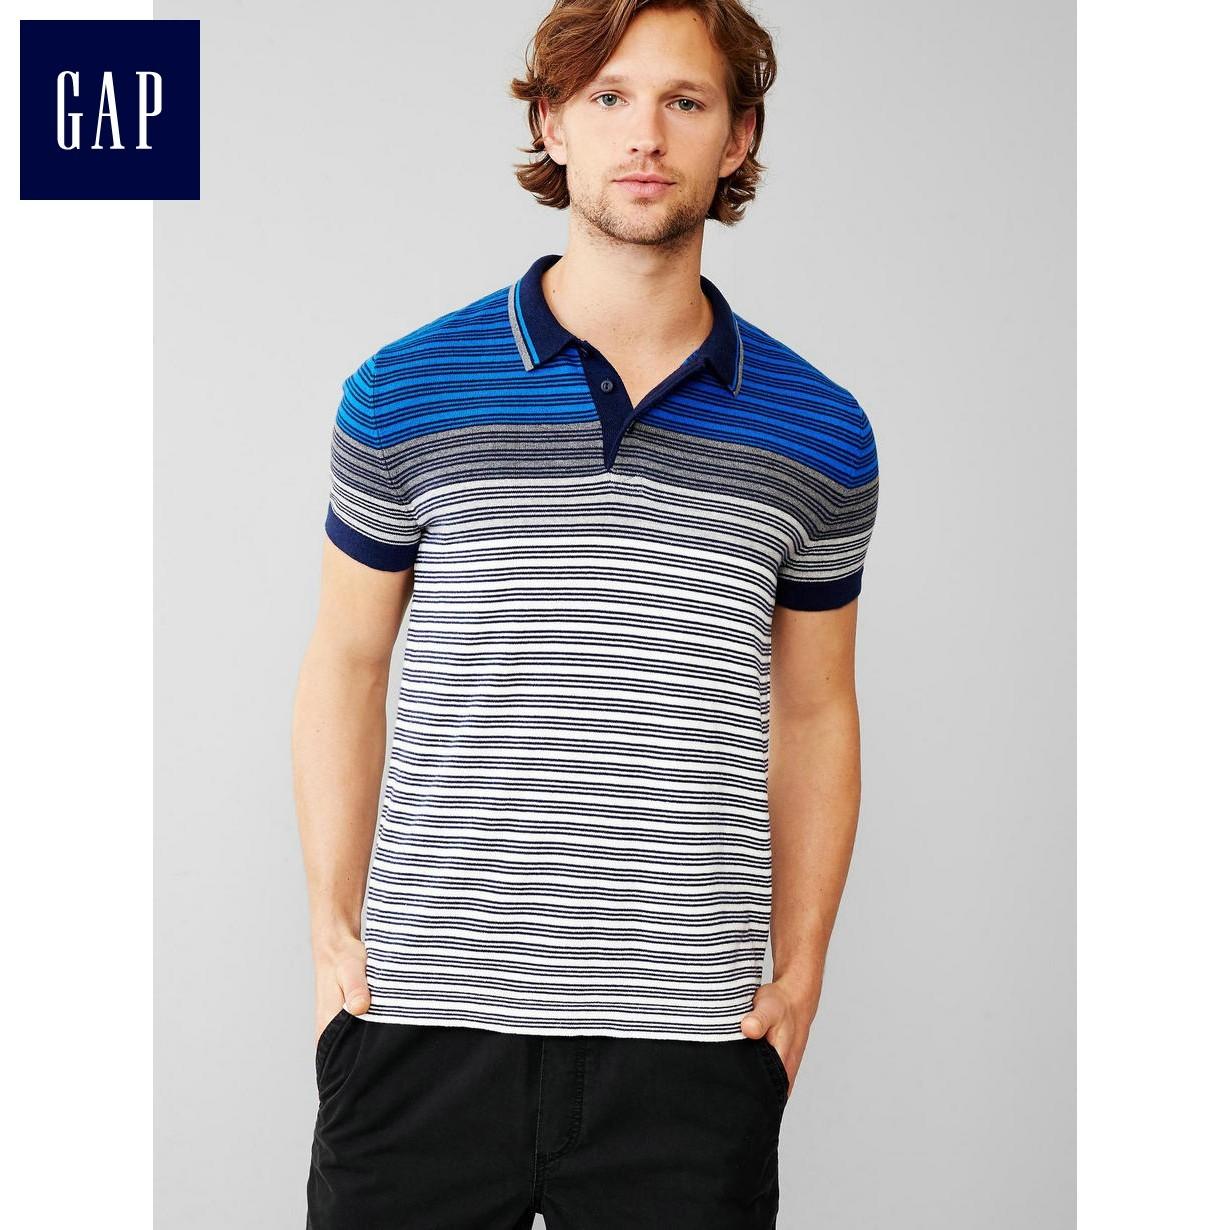 Рубашка поло  000421300 Gap Polo 421300 249 рубашка мужская gap 142643 349